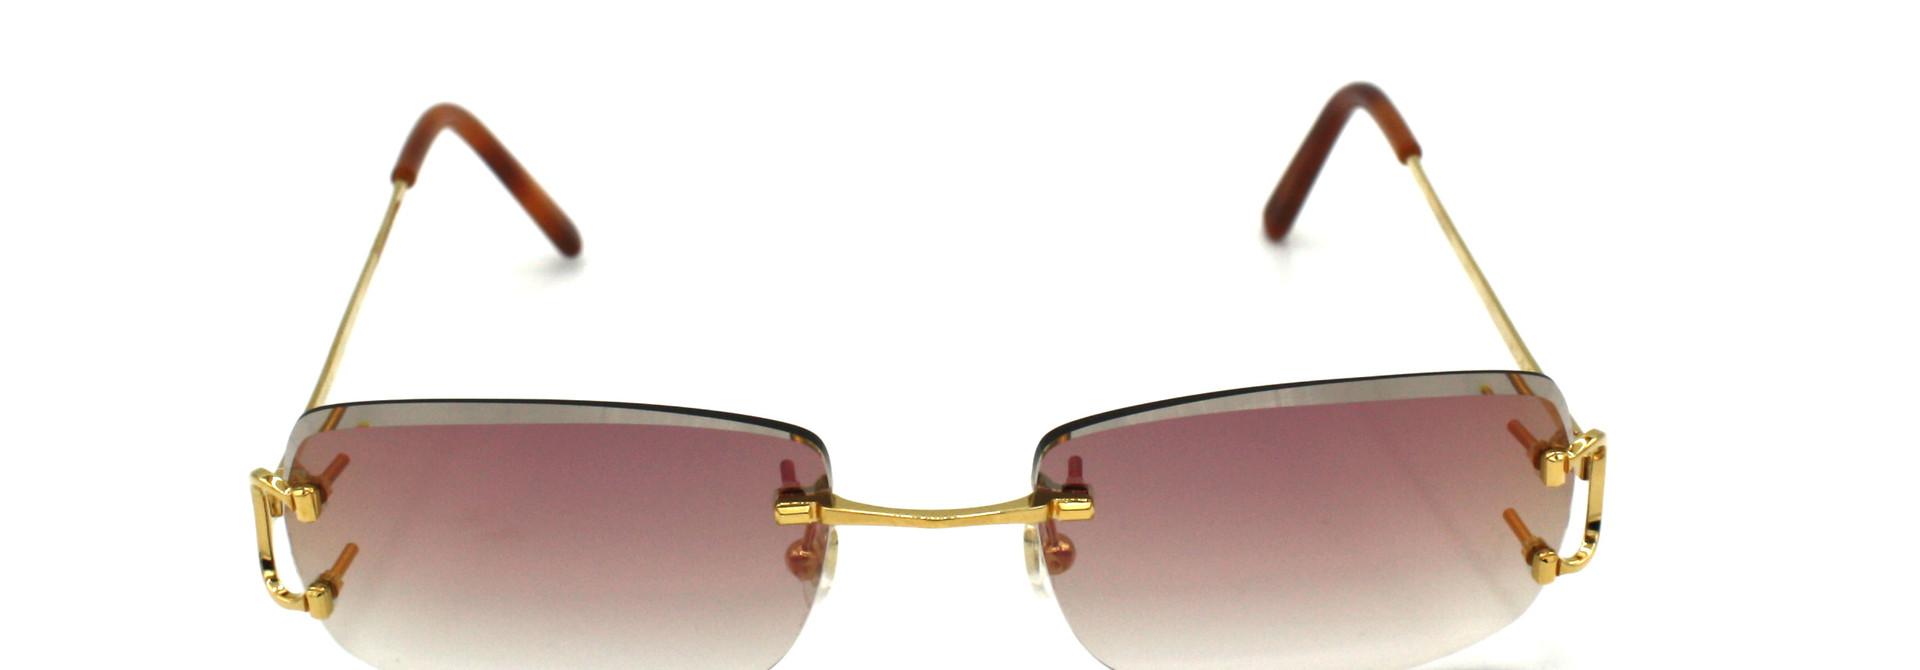 Cartier - CT0092O - 001 Maroon Coppershine Diamond Cut